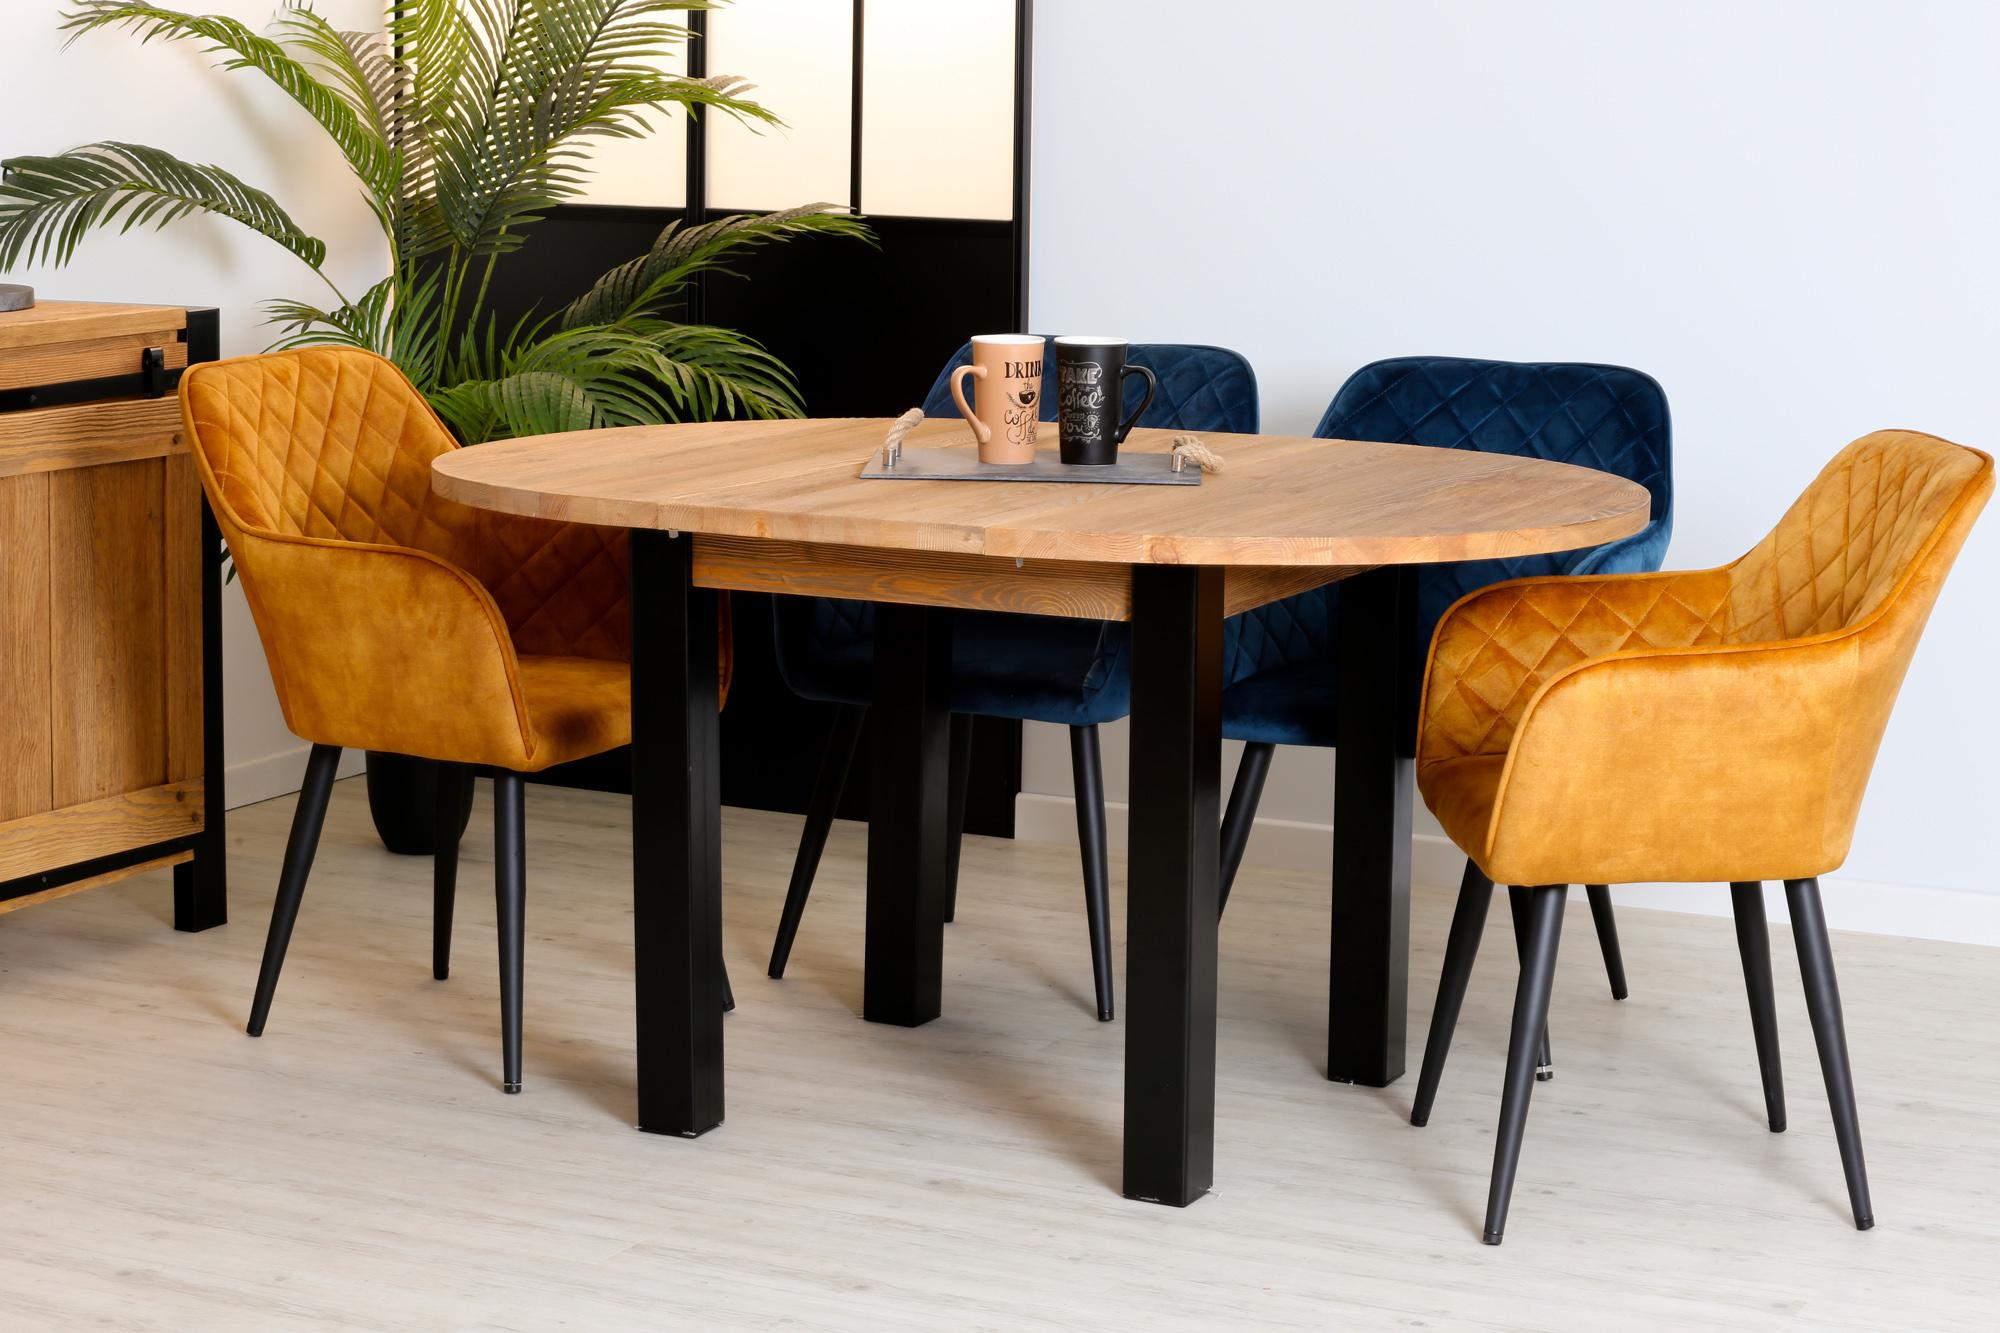 table a manger ronde bois massif 110 150 loundge avec 1 allonge